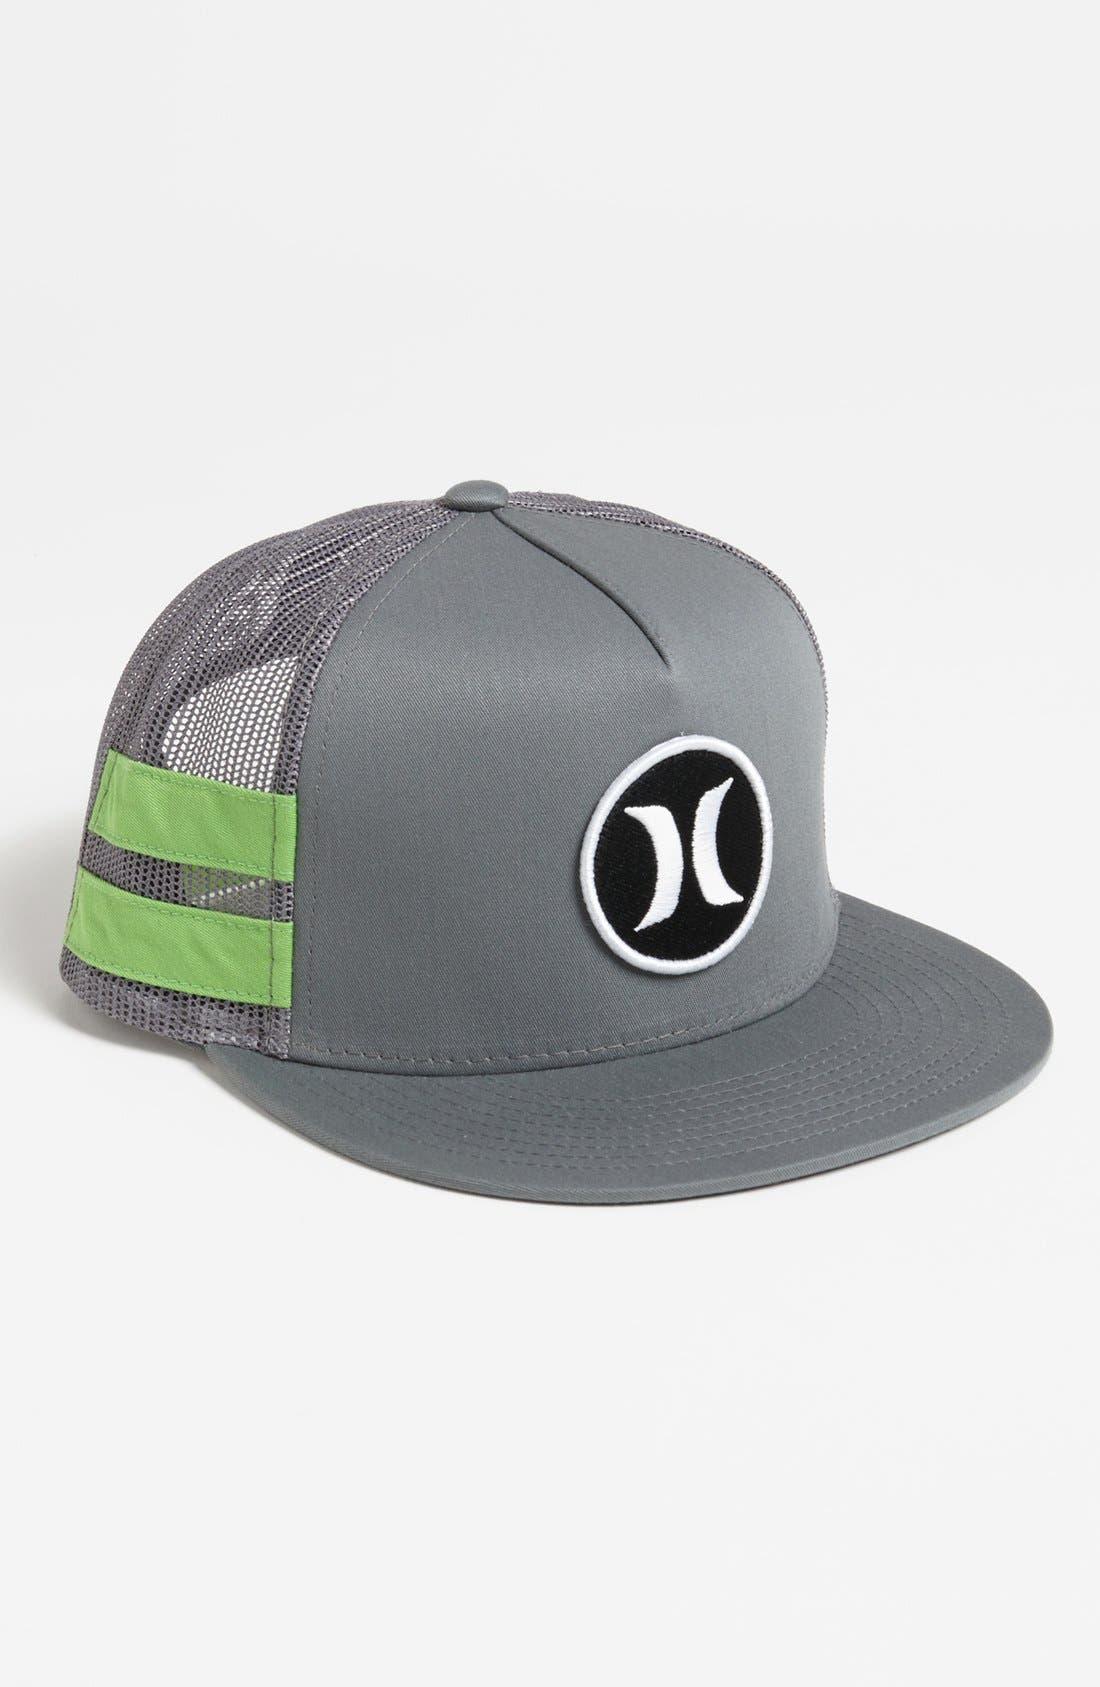 Alternate Image 1 Selected - Hurley 'Block Party' Trucker Hat